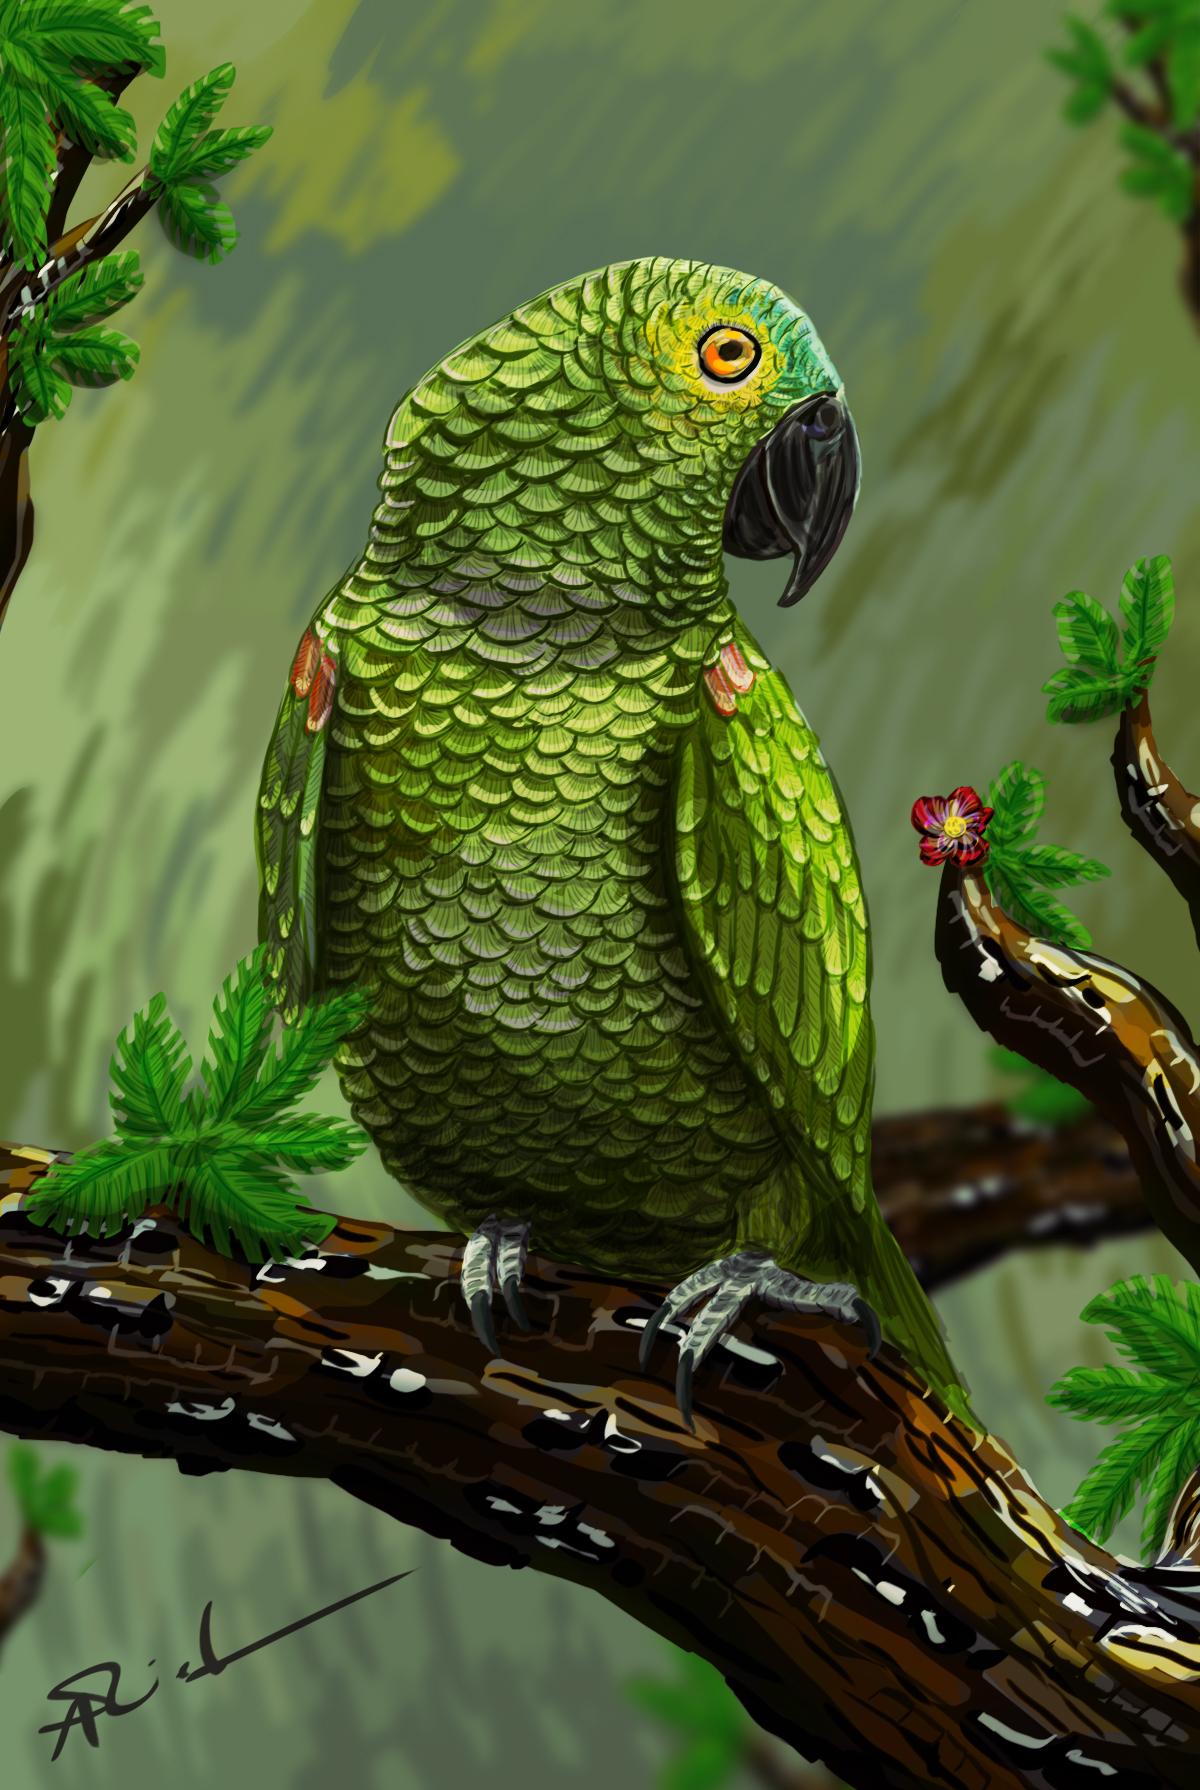 Stephanriederer kiko the parrot 1 2bc027f8 y5hk